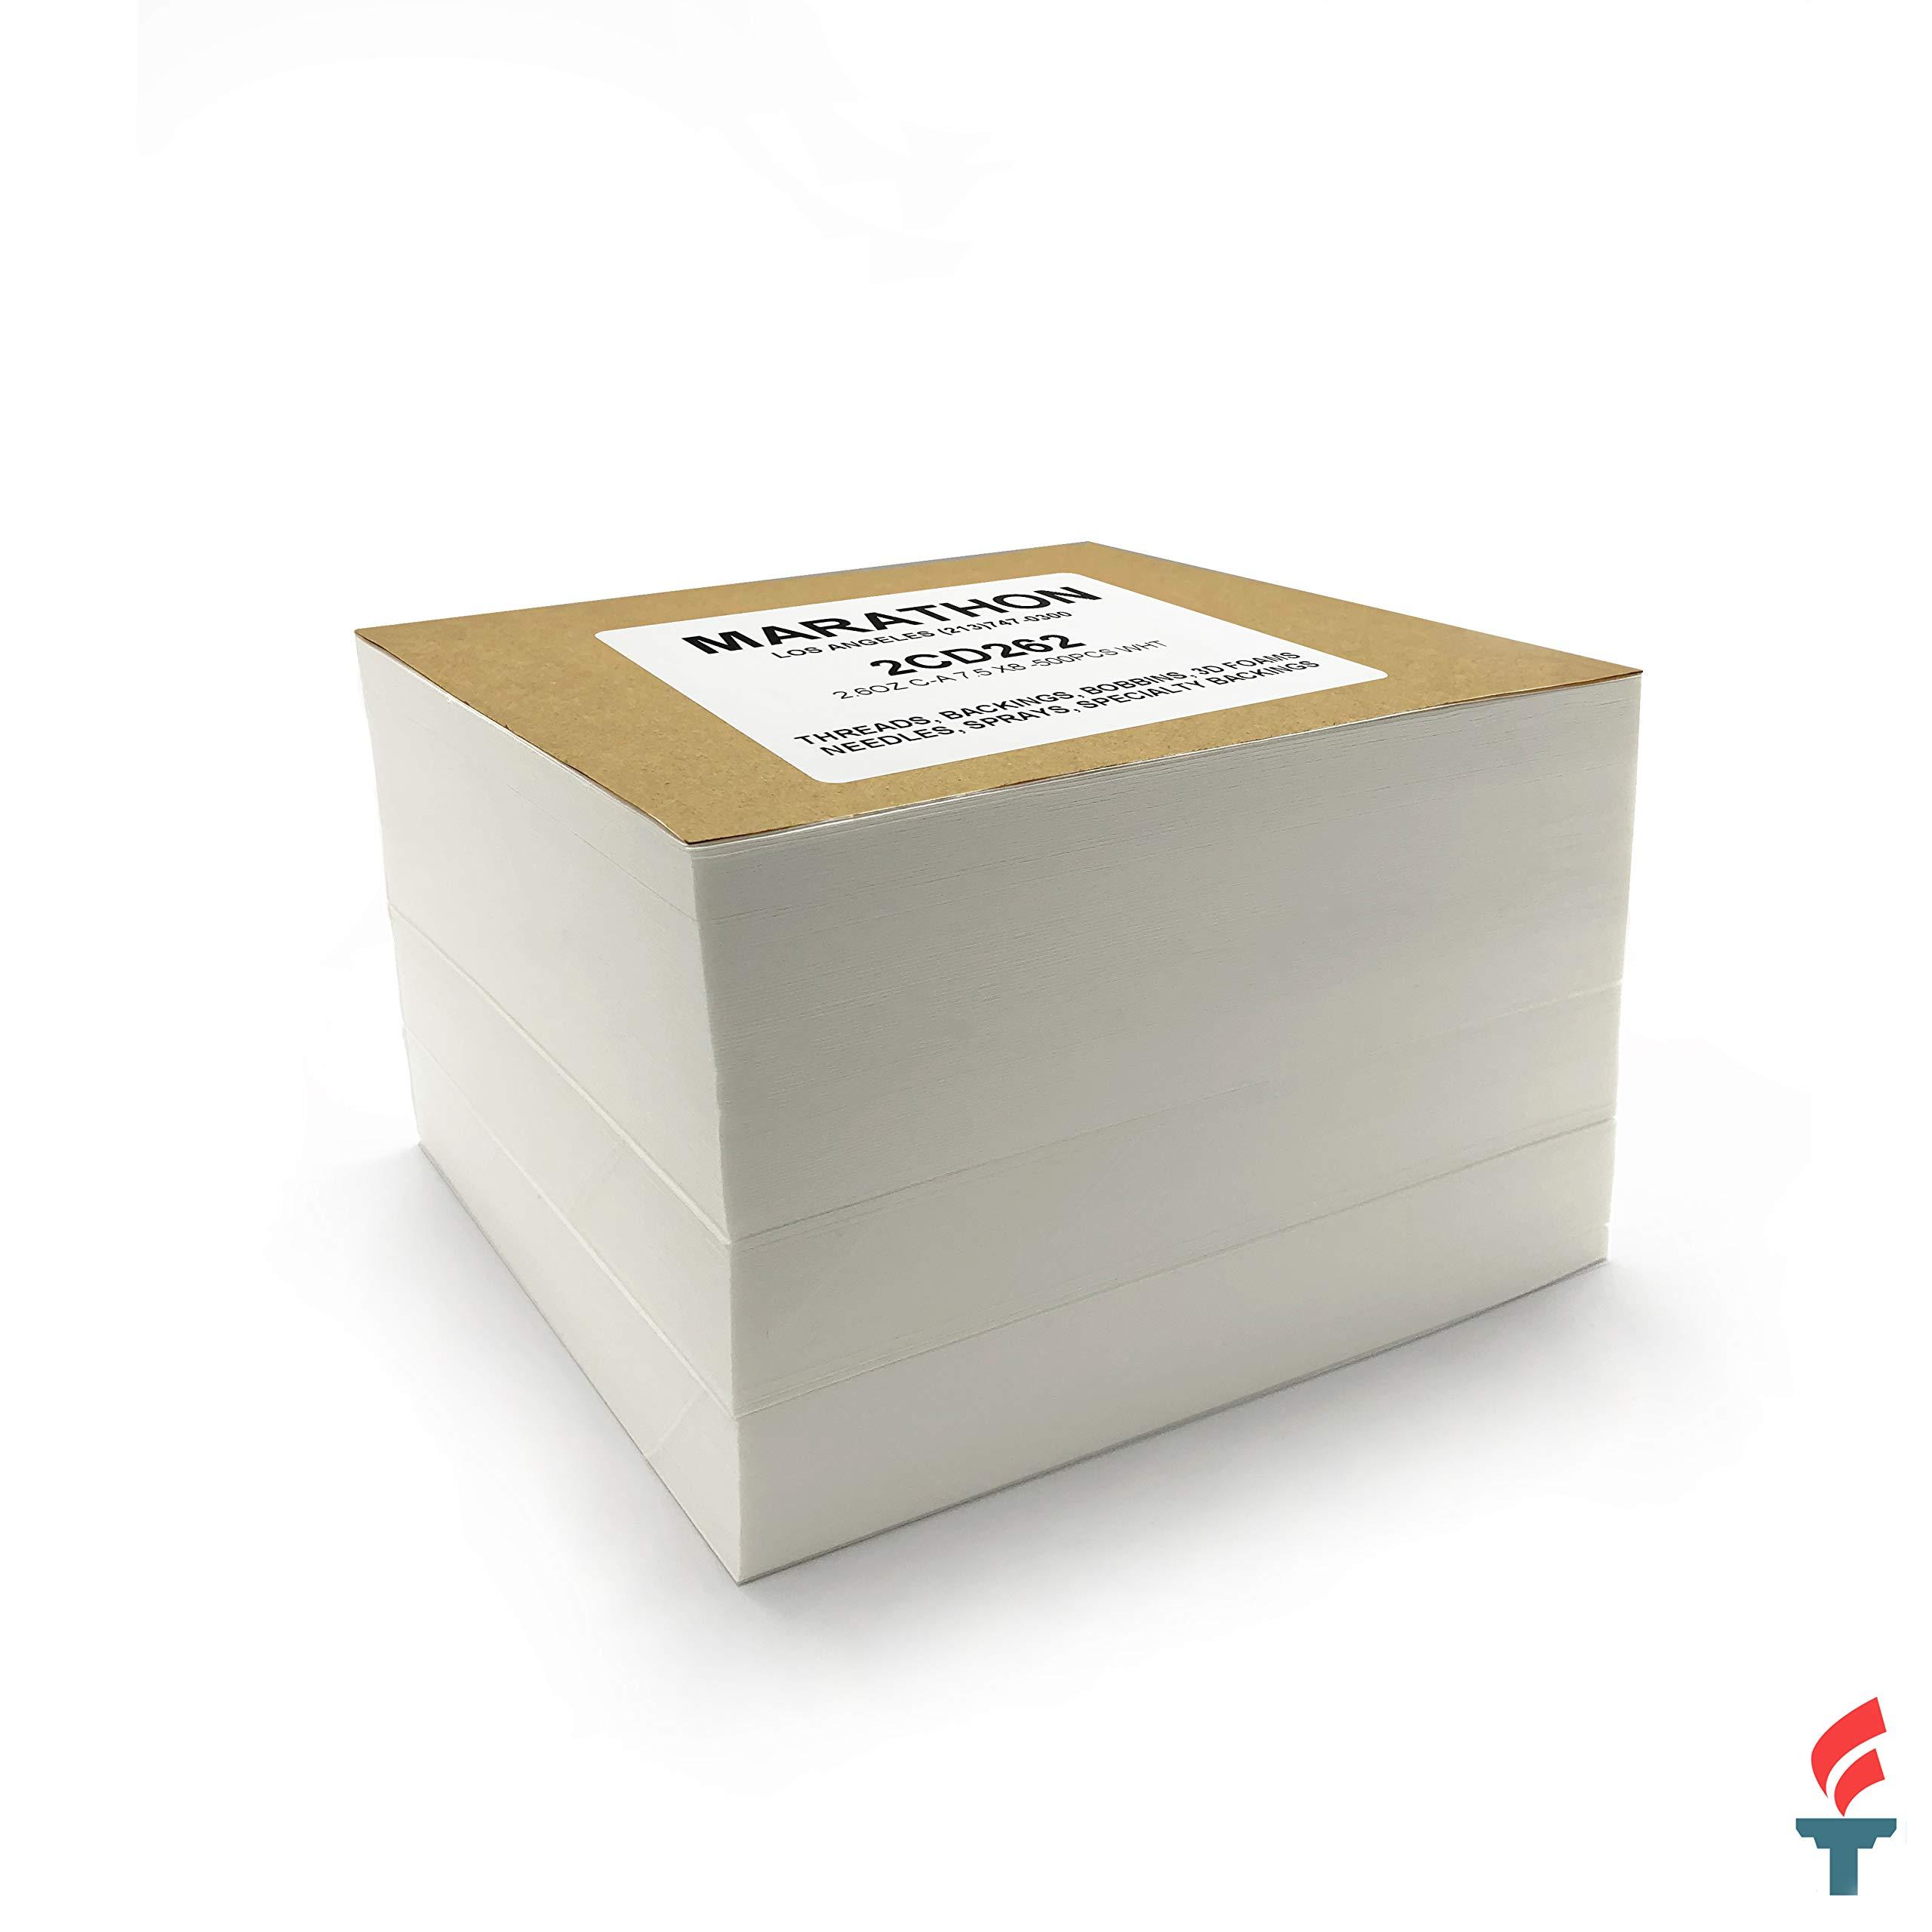 Marathon - Dispenser Roll Paper Towels, 350 Ft. Rolls - 12 Rolls by Marathon (Image #1)